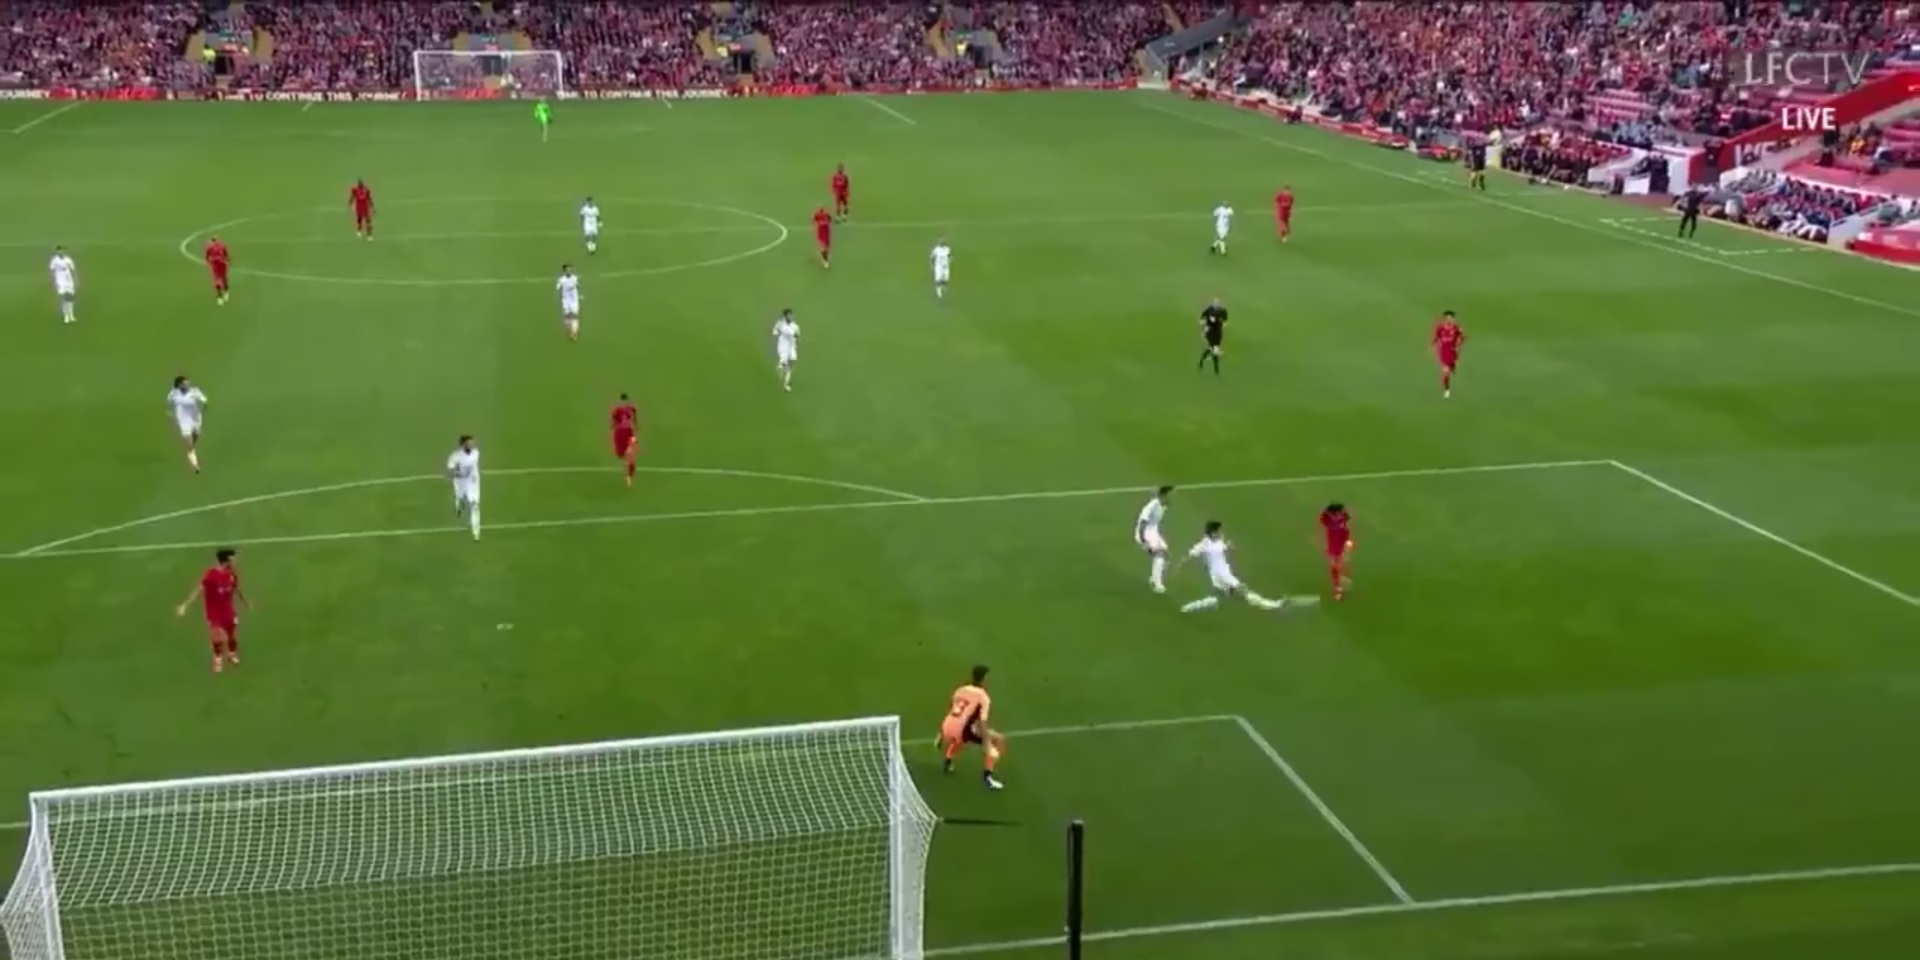 (Video) Minamino scores again for Liverpool in pre-season with fortunate finish